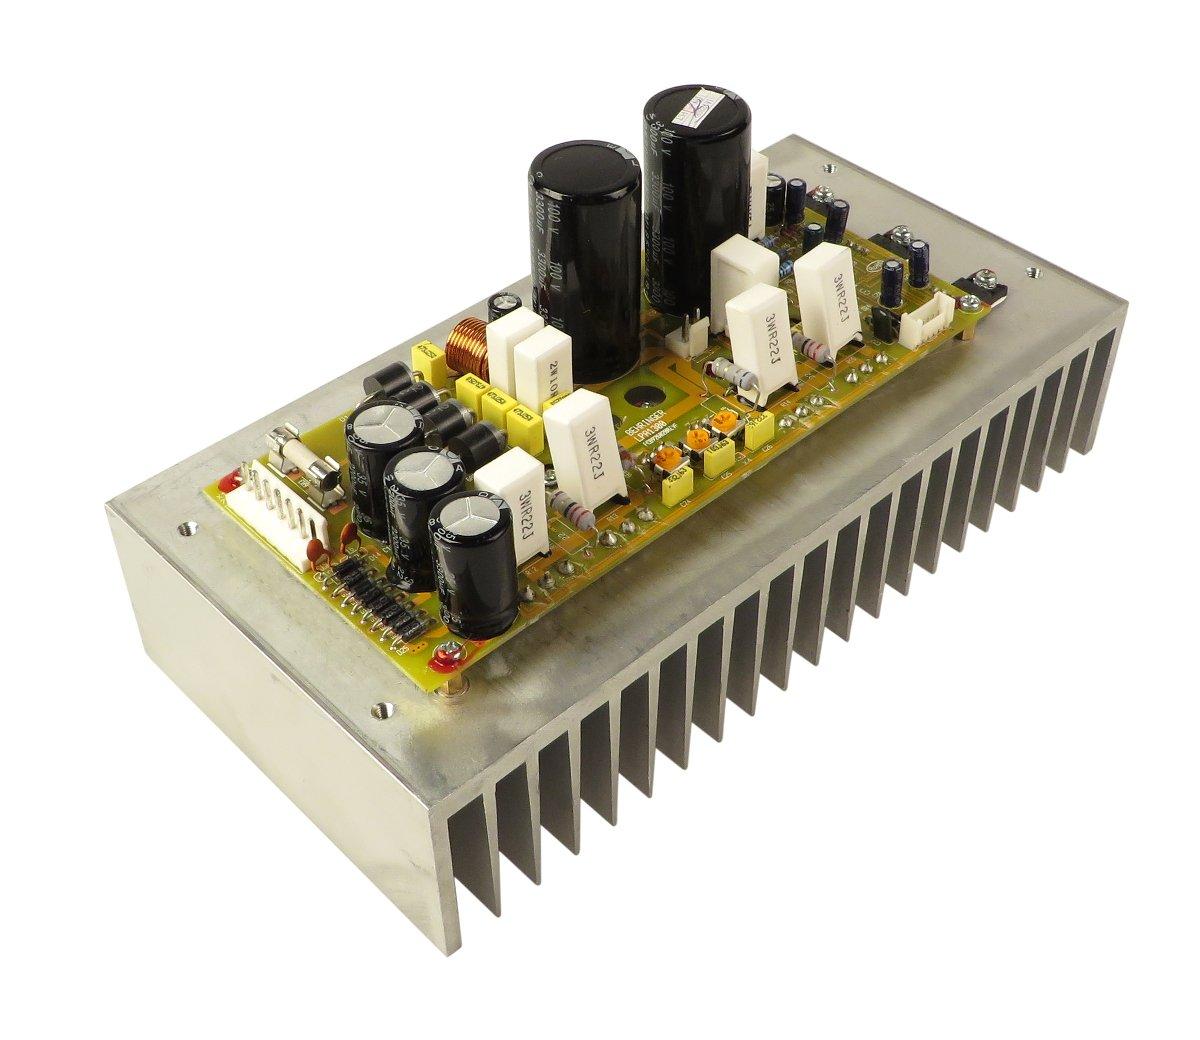 Amp PCB for Ultratone K3000FX